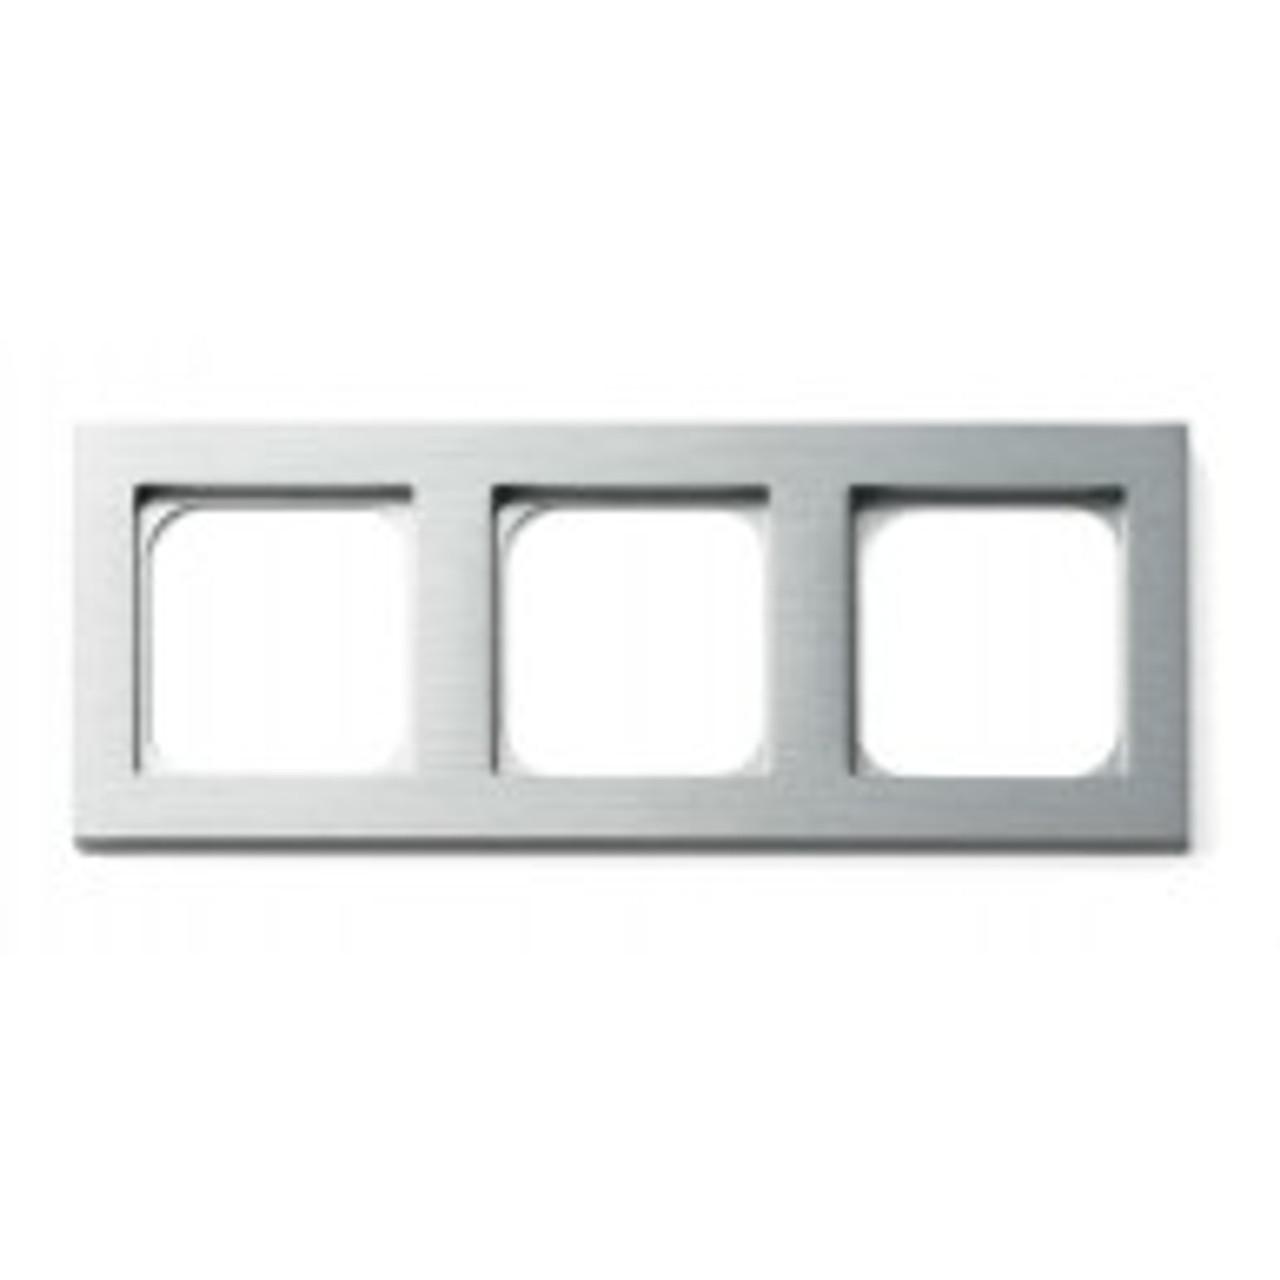 Frame - 3 gang - brushed aluminium